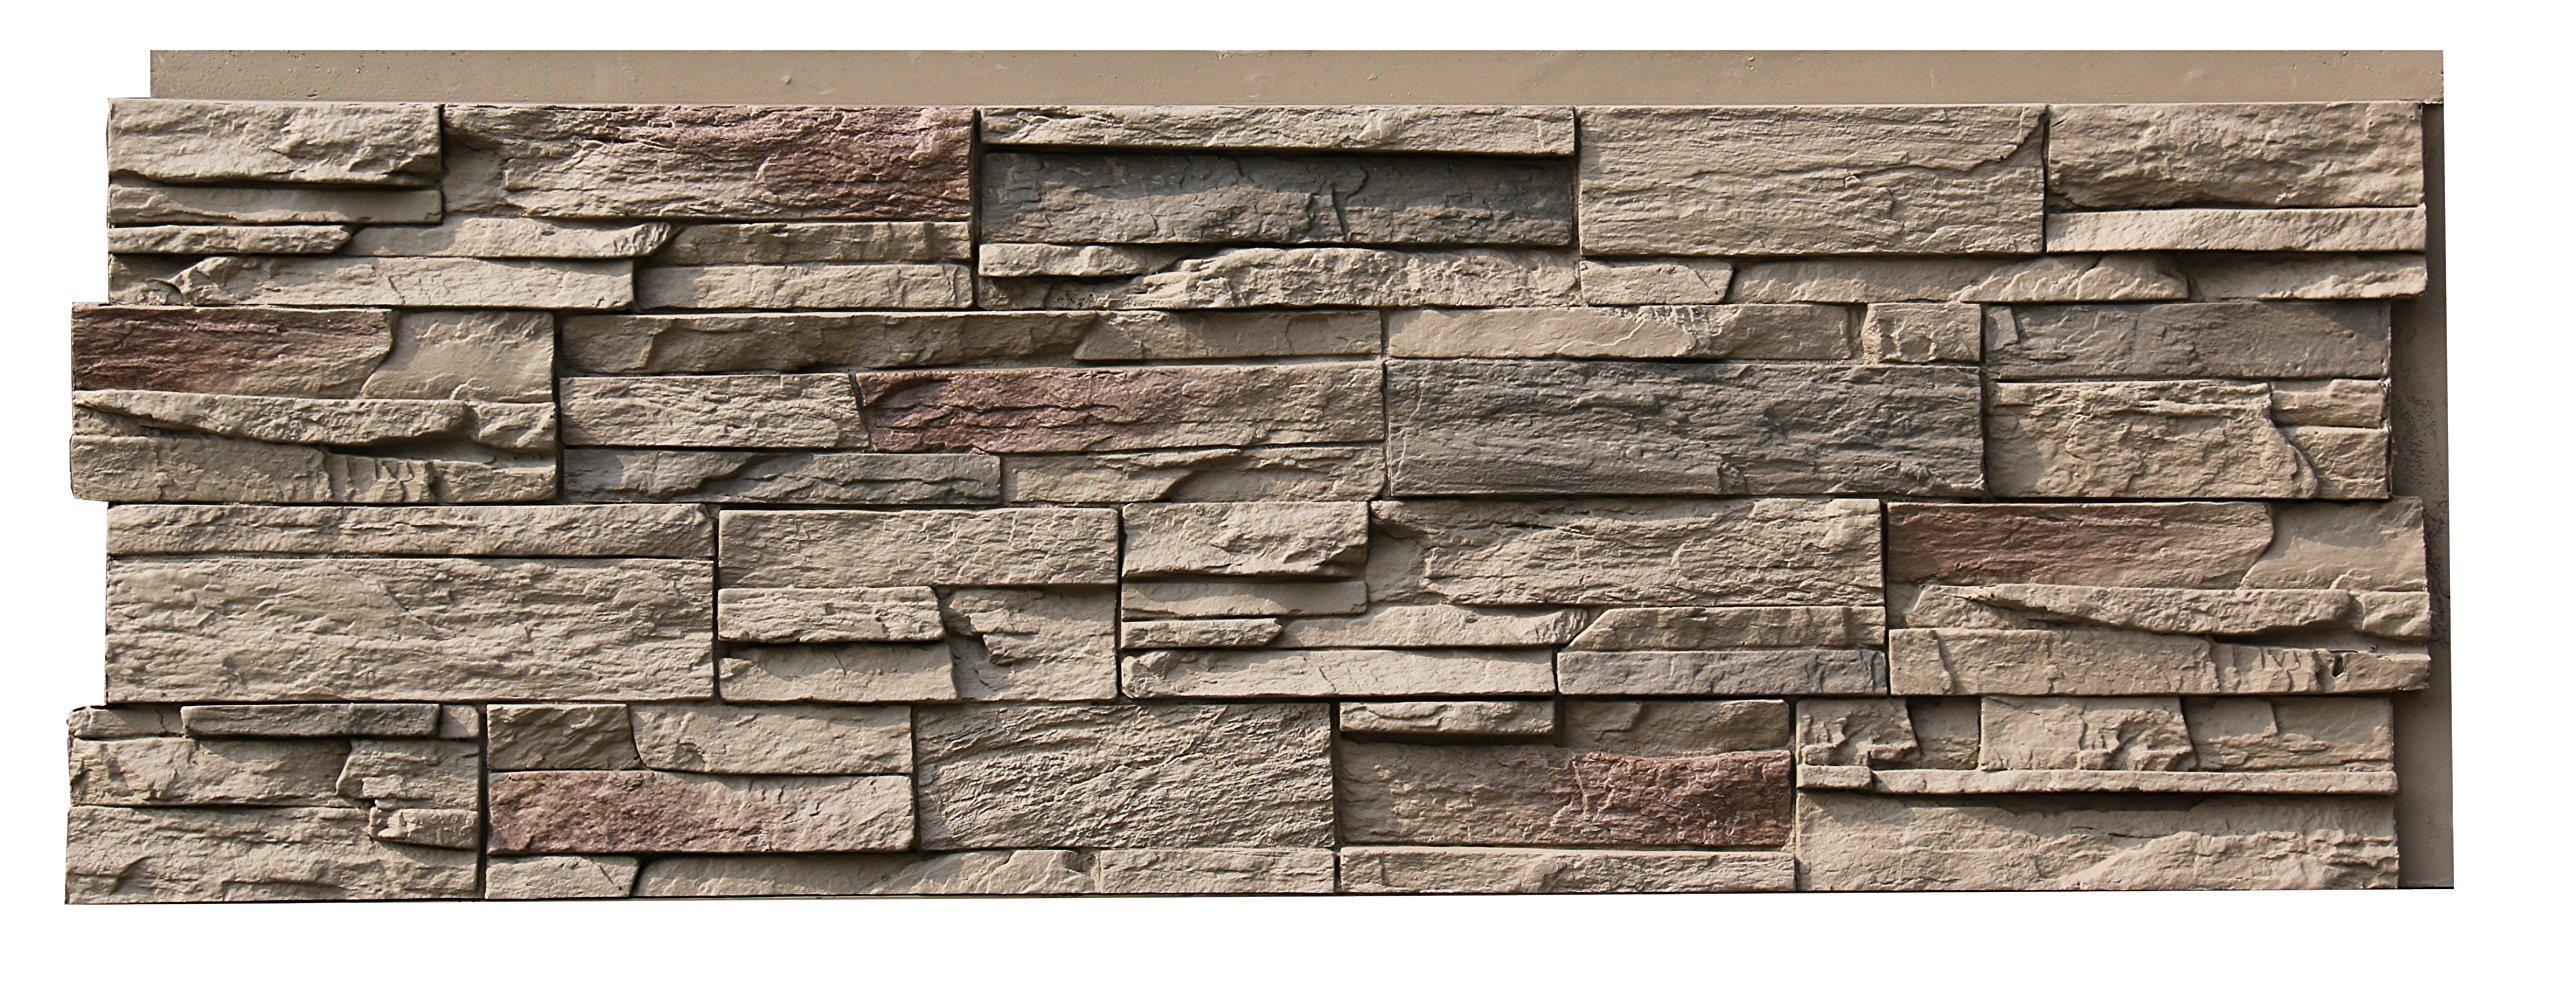 NextStone Polyurethane Faux Stone Panel - Country Ledgestone - Teton Buff (4 Panels per Box) by NextStone